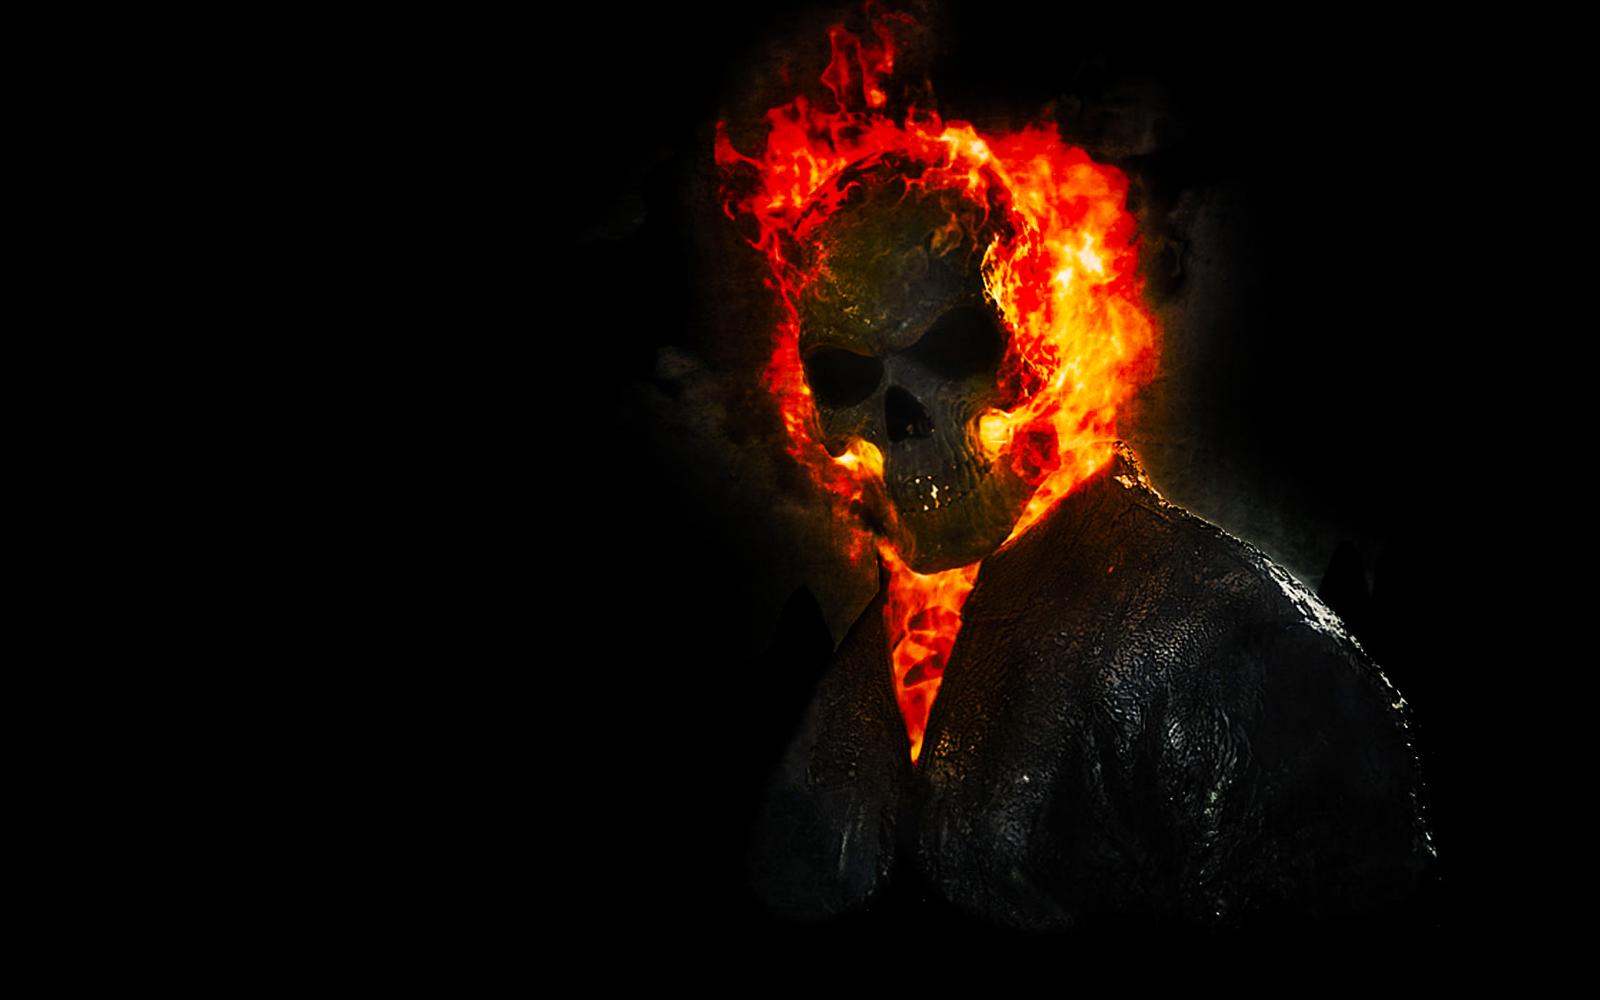 Ghost Rider Spirit Of Vengeance Blue Fire | www.pixshark ...  Ghost Rider Spirit Of Vengeance Blue Fire